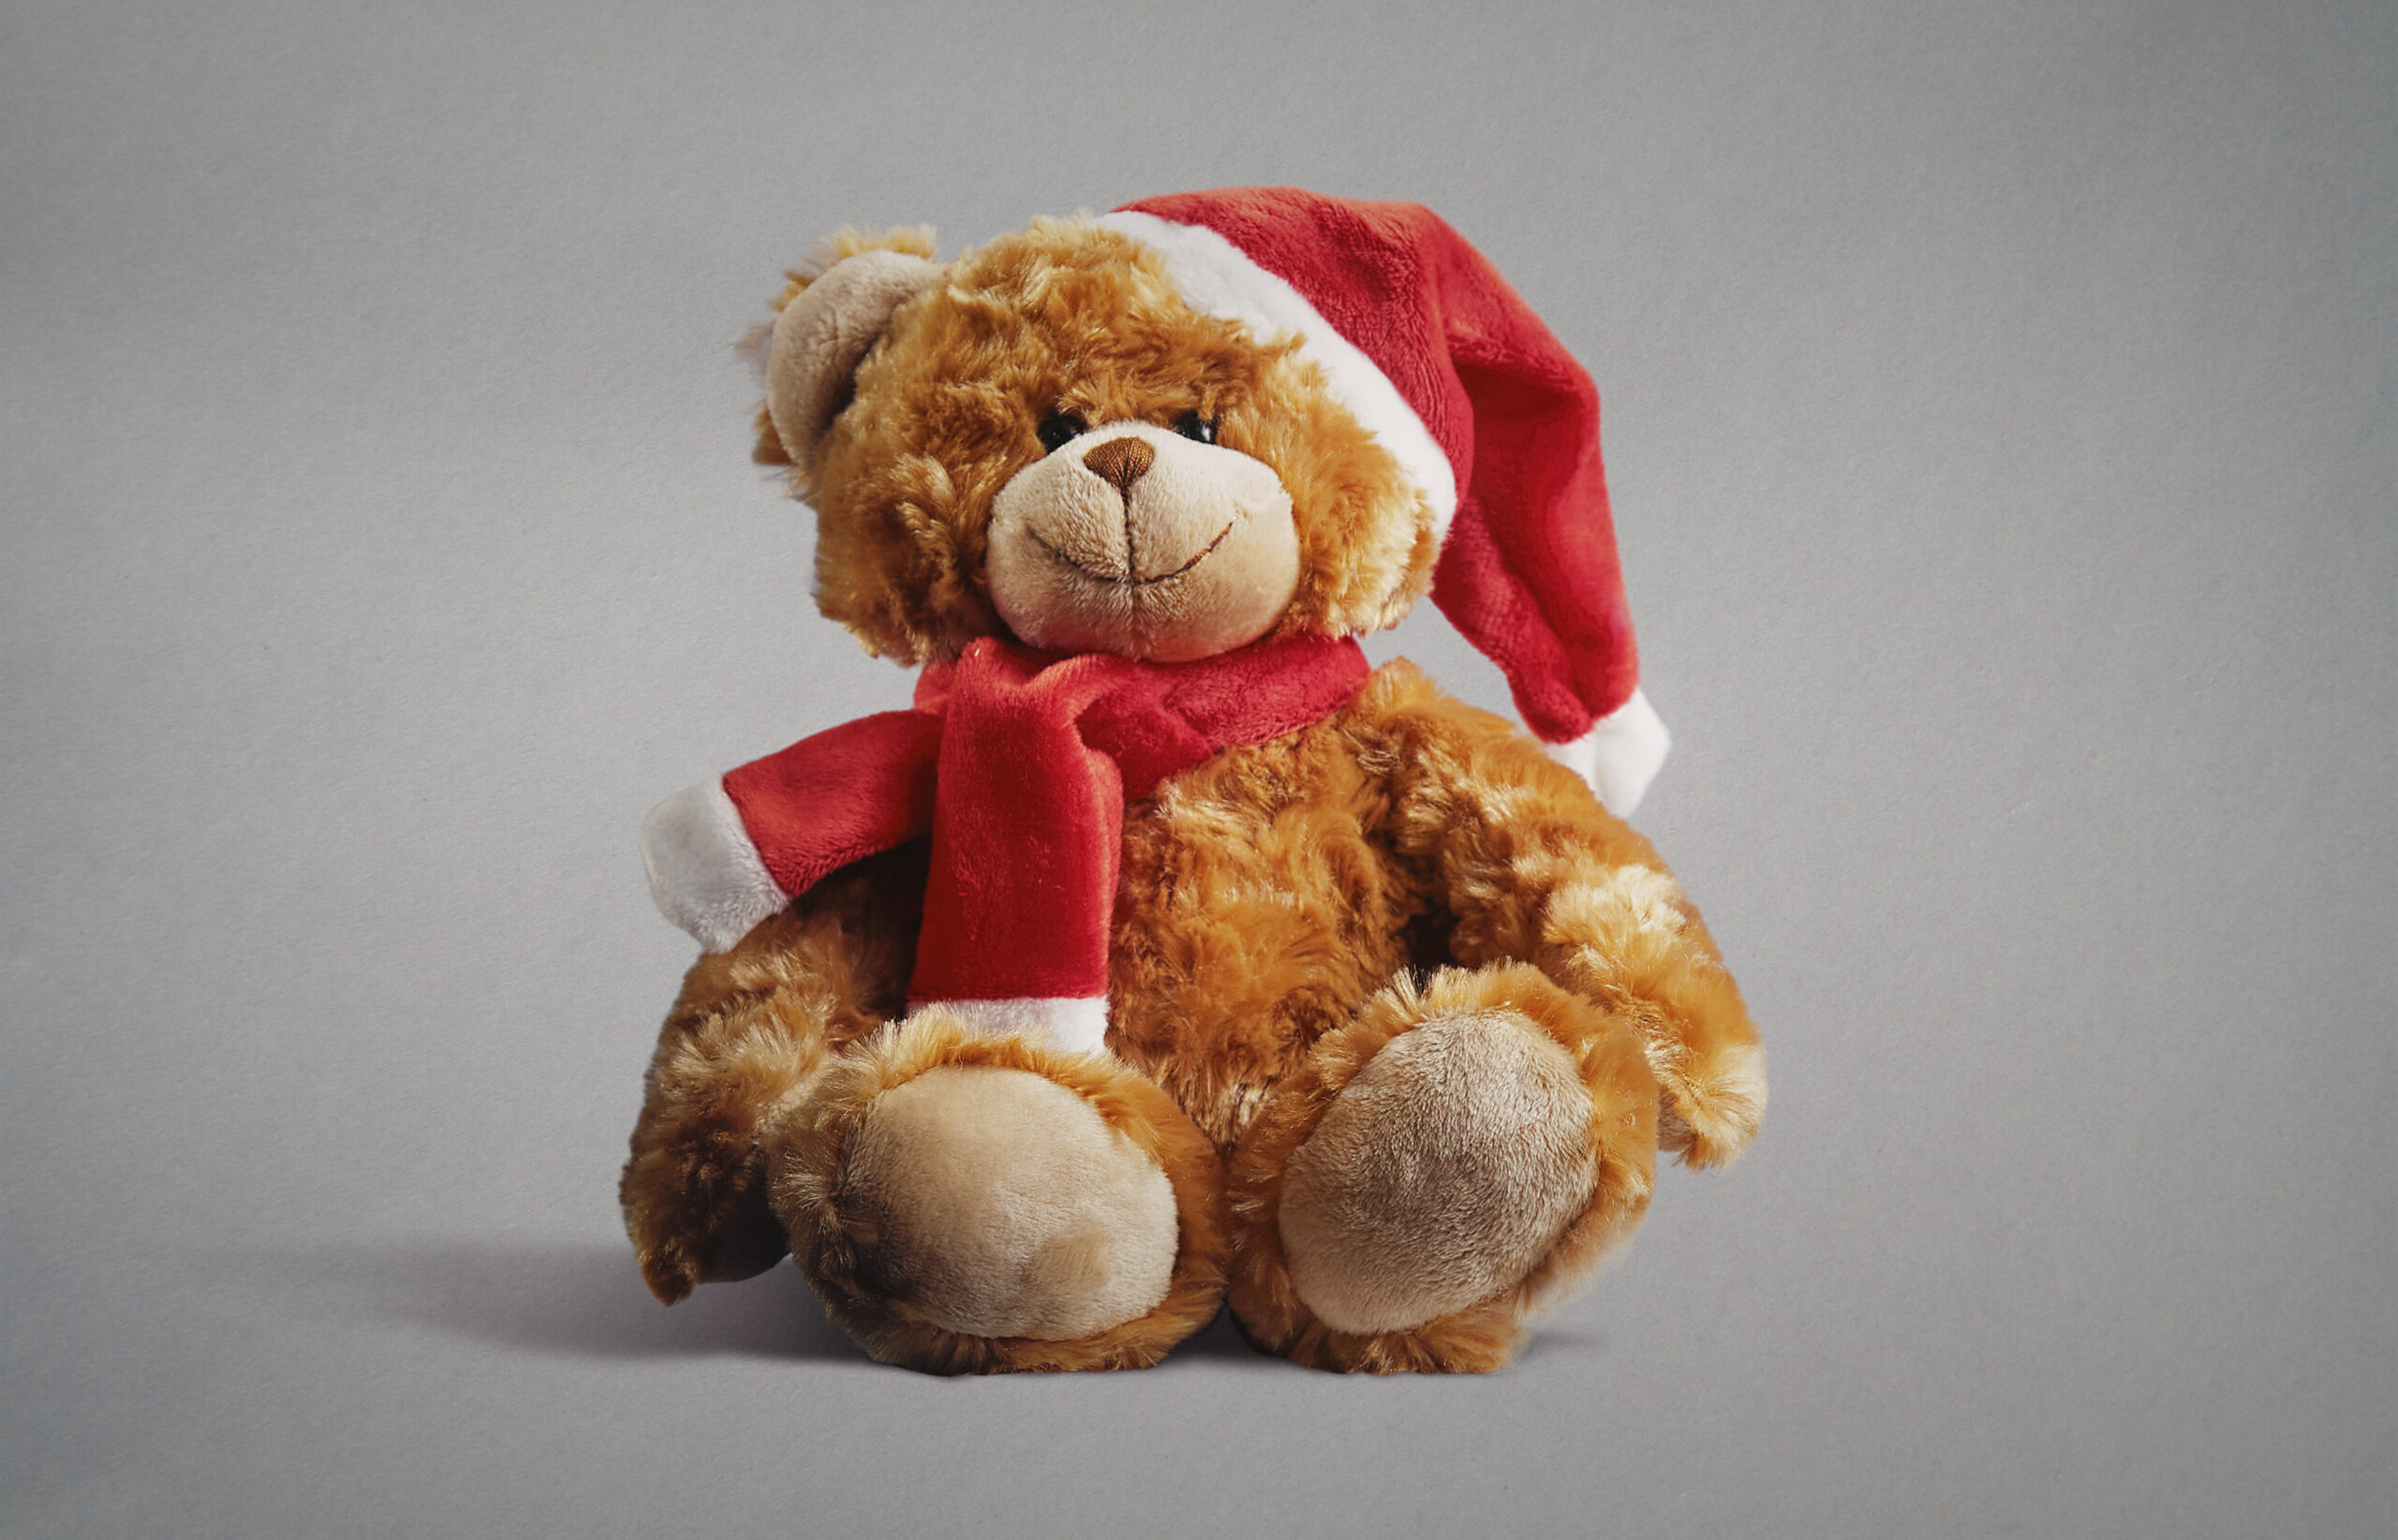 Teddy Incentive